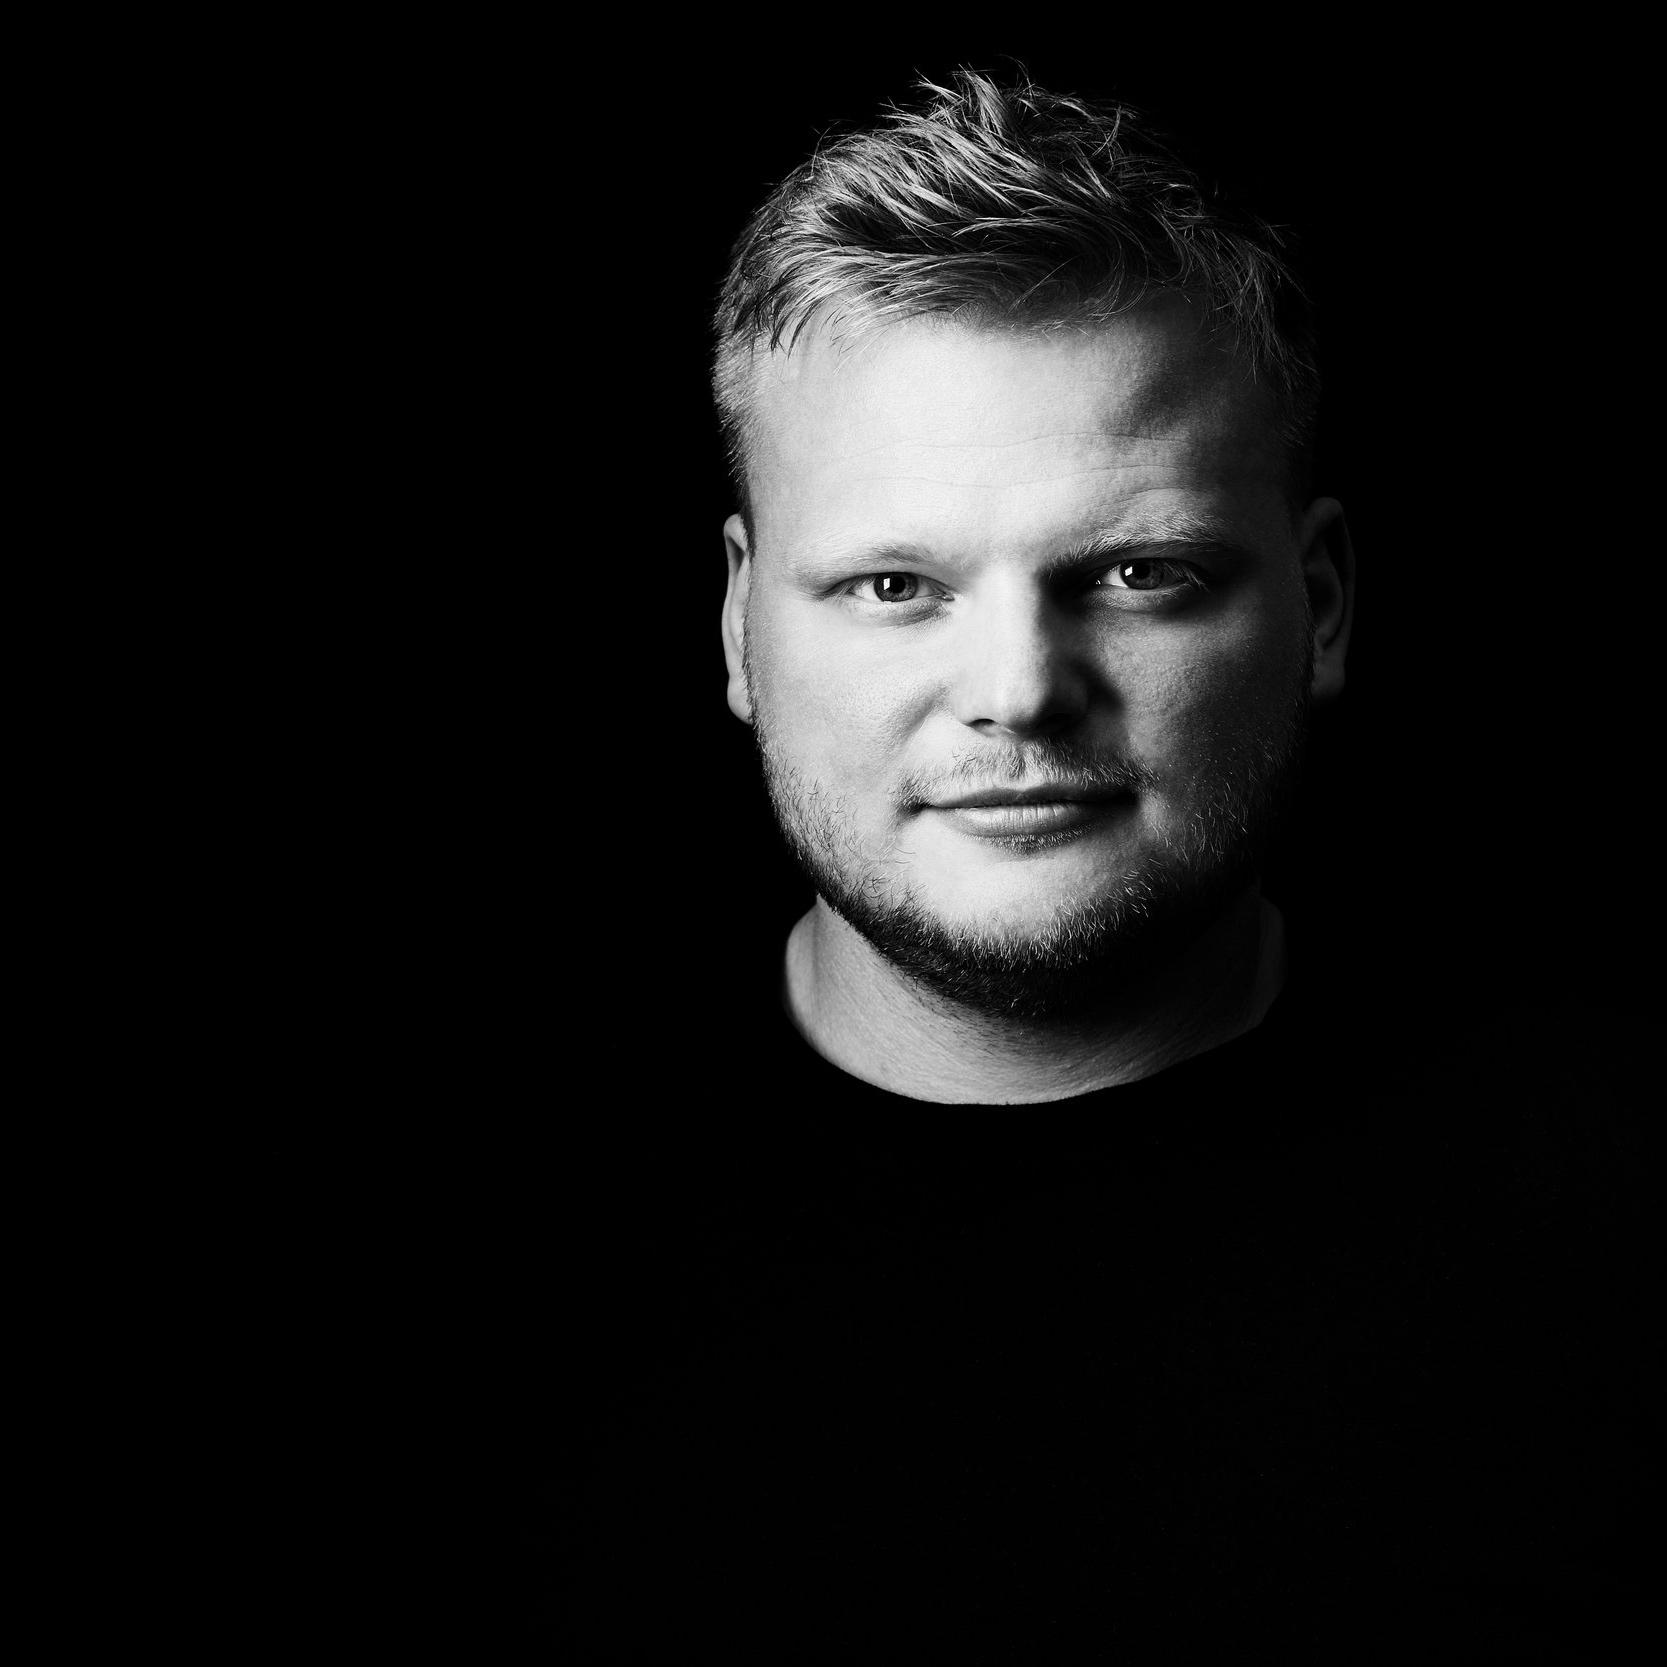 Rasmus+Munk_3_by+S%C3%B8ren+Gammelmark.jpg